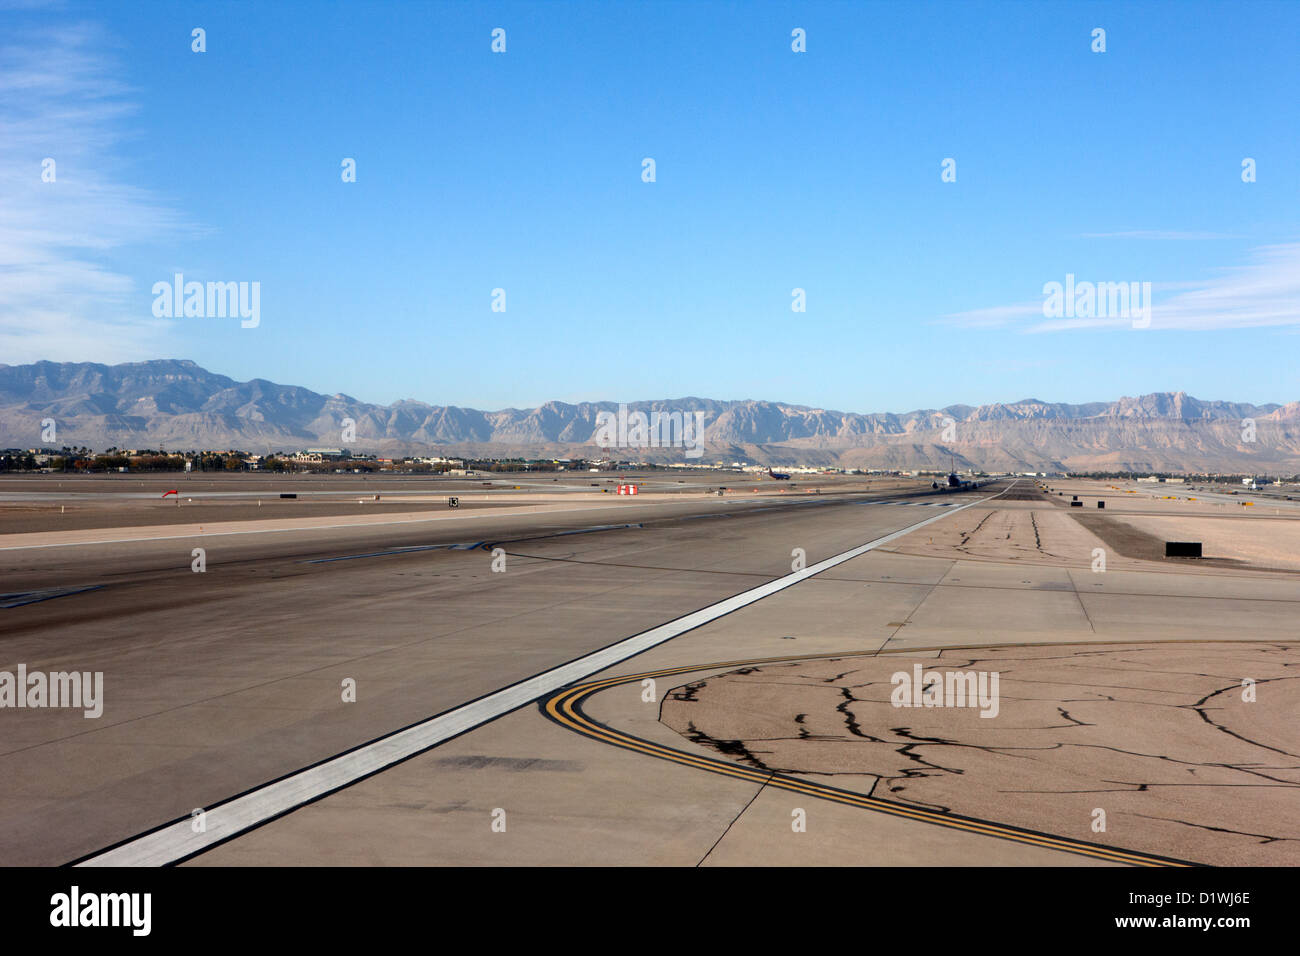 runway at McCarran International airport Las Vegas Nevada USA - Stock Image